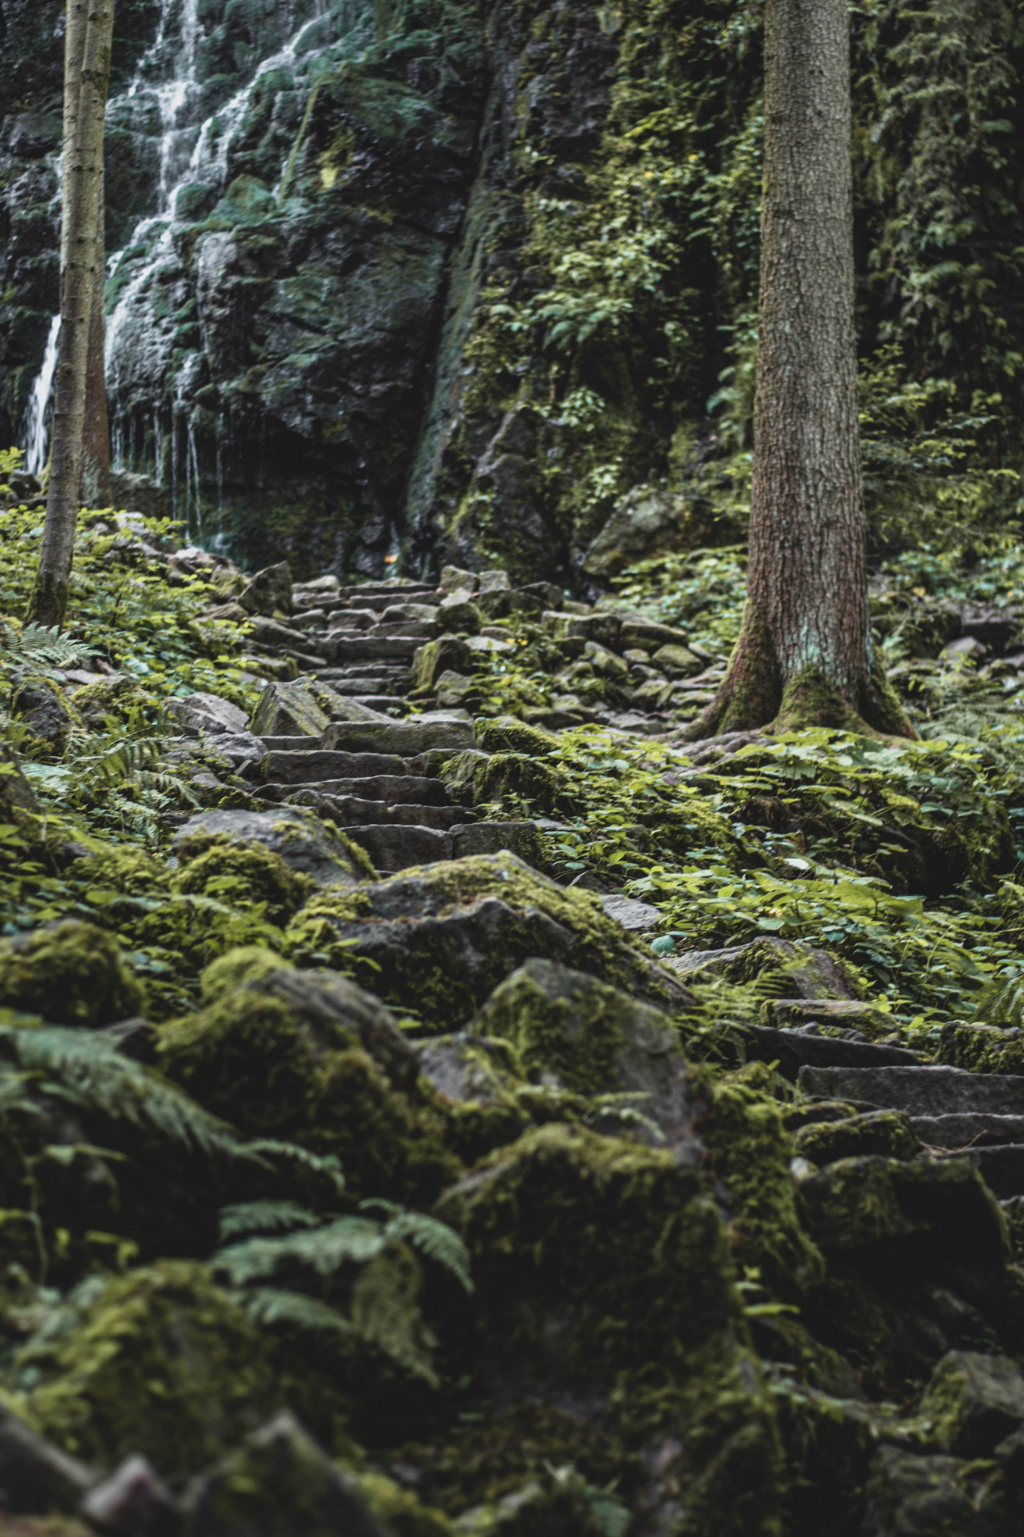 Moosbedeckte Stufen